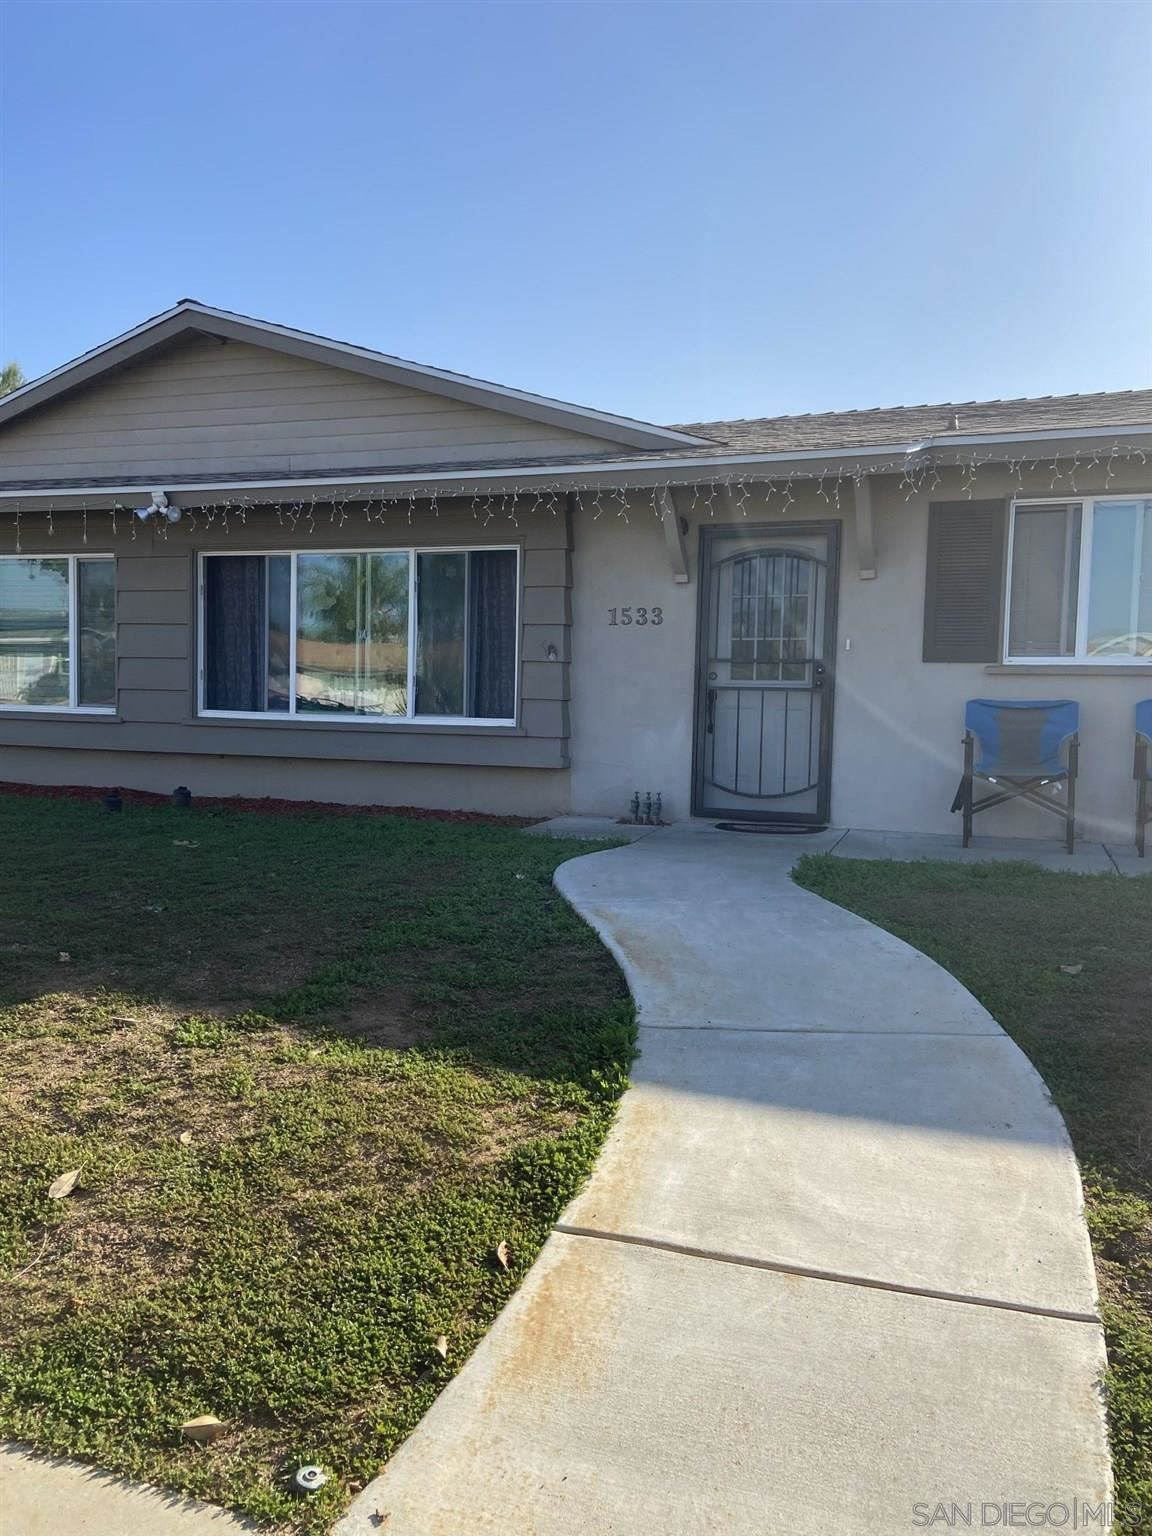 Photo of 1533 Markerry Ave, El Cajon, CA 92019 (MLS # 210000831)